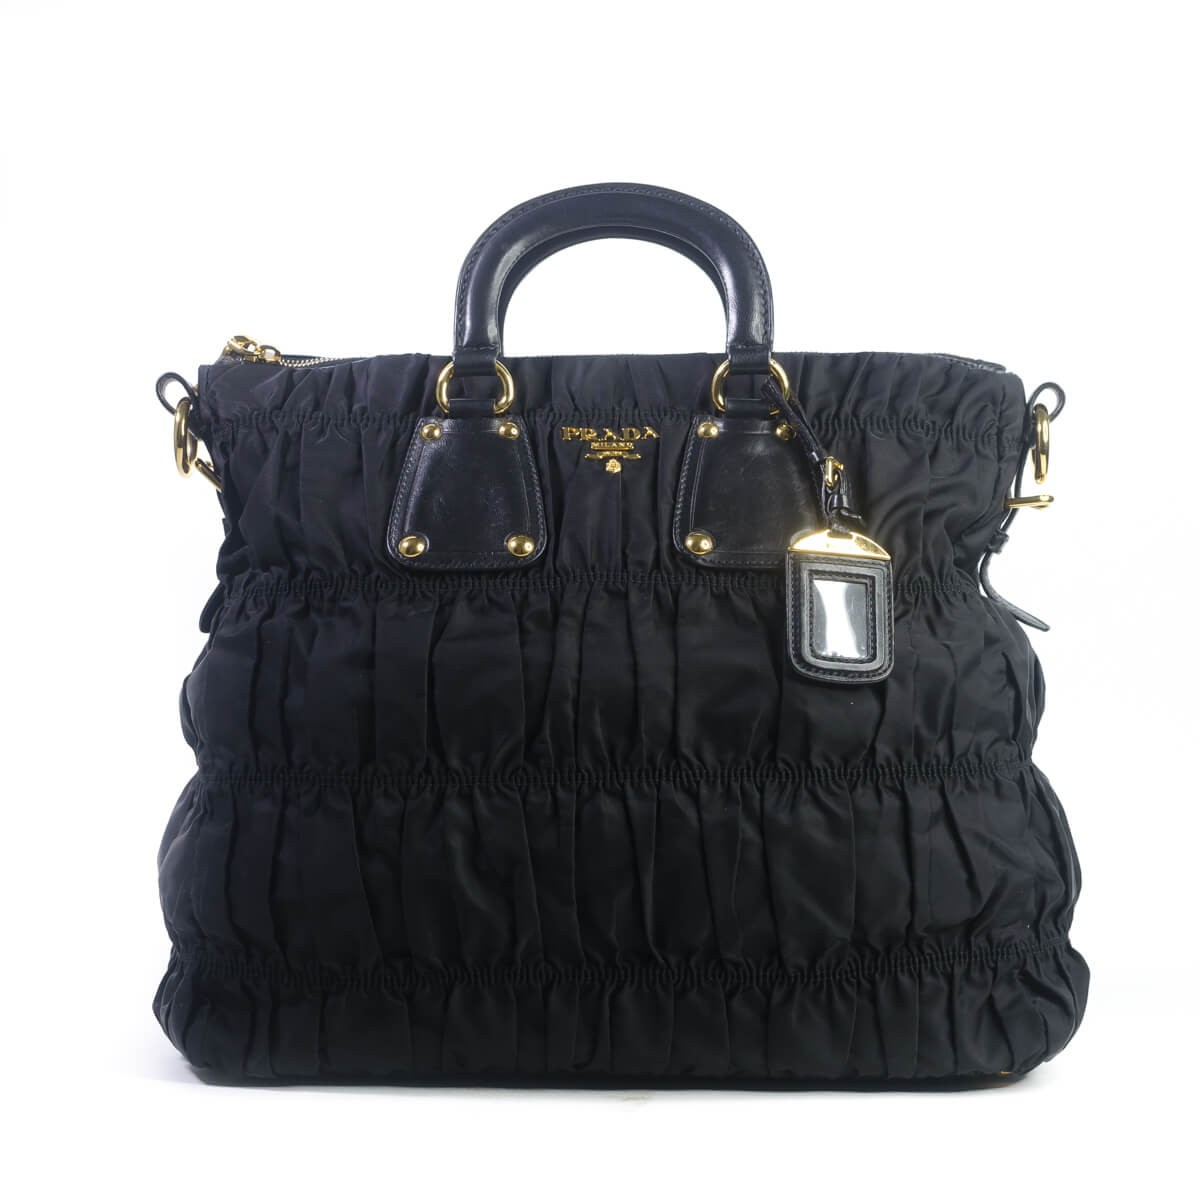 49284dc318385d Tessuto Nylon Gaufre Tote Bag